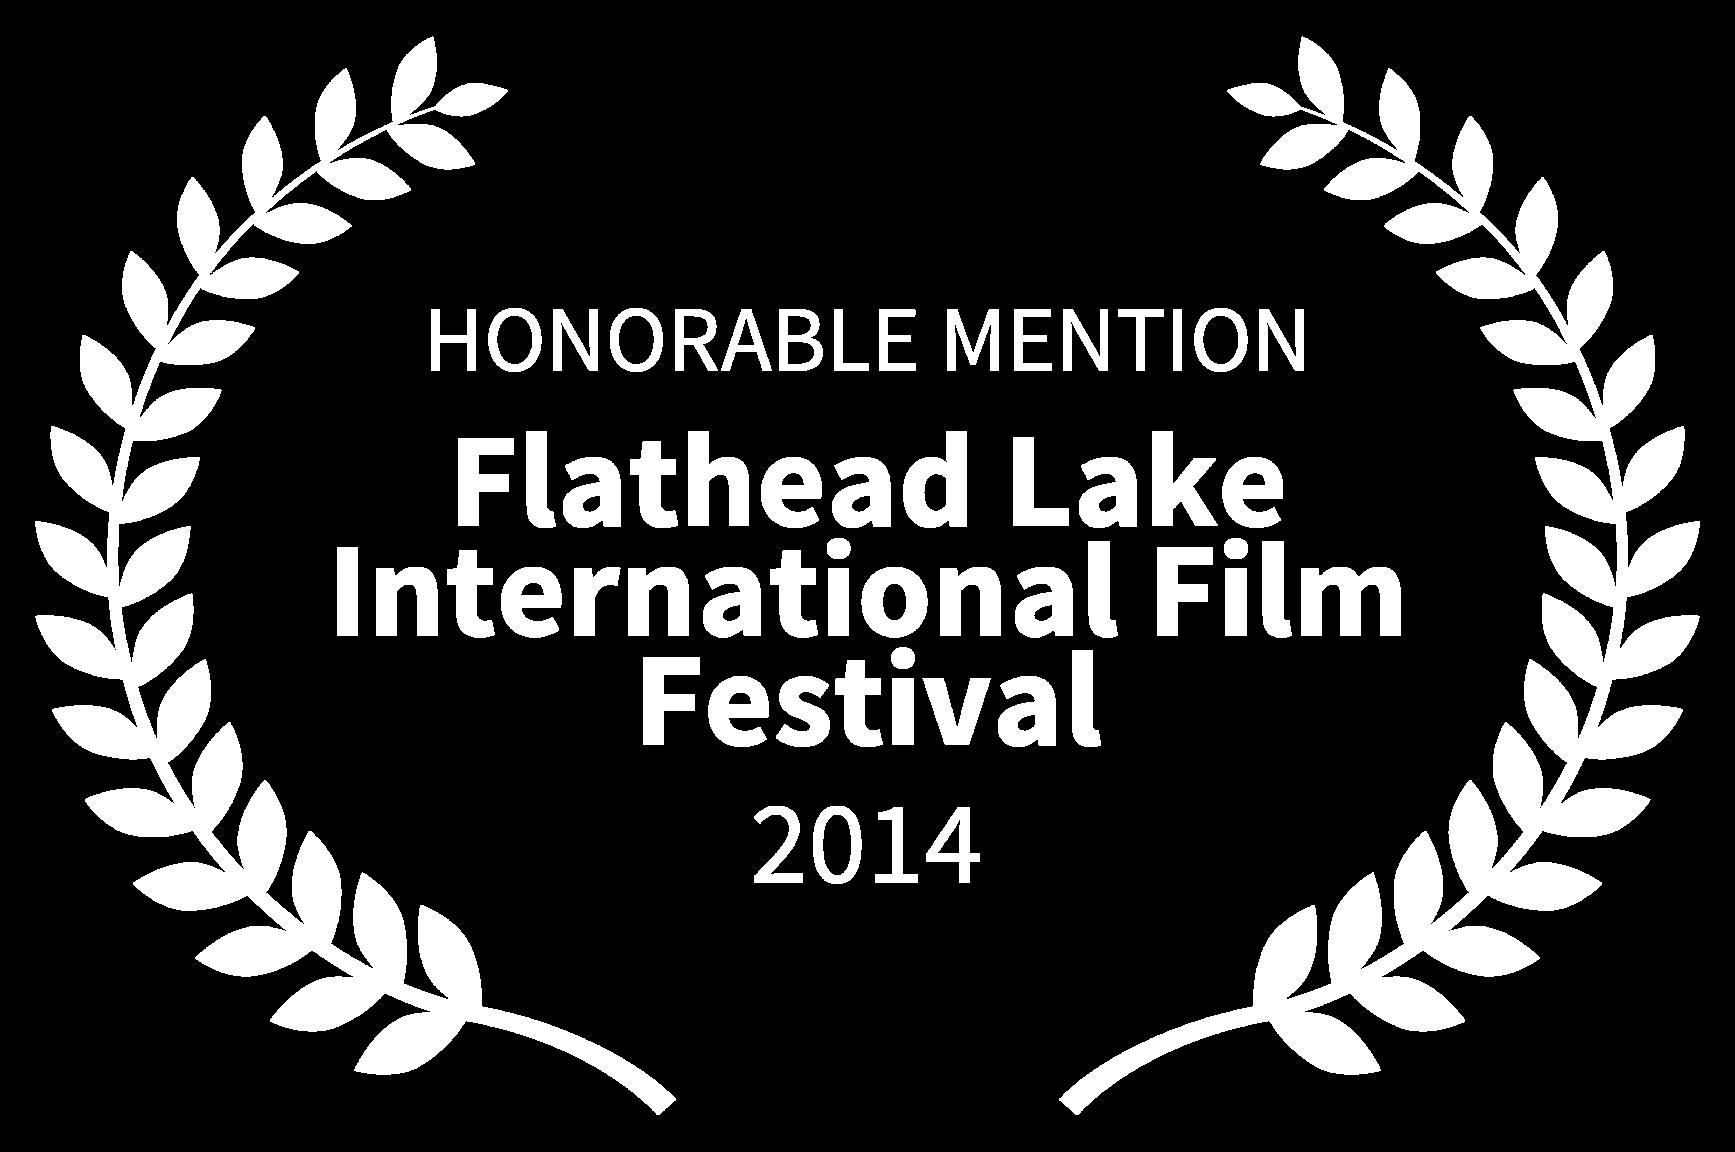 HONORABLE MENTION - Flathead Lake International Film Festival - 2014.png